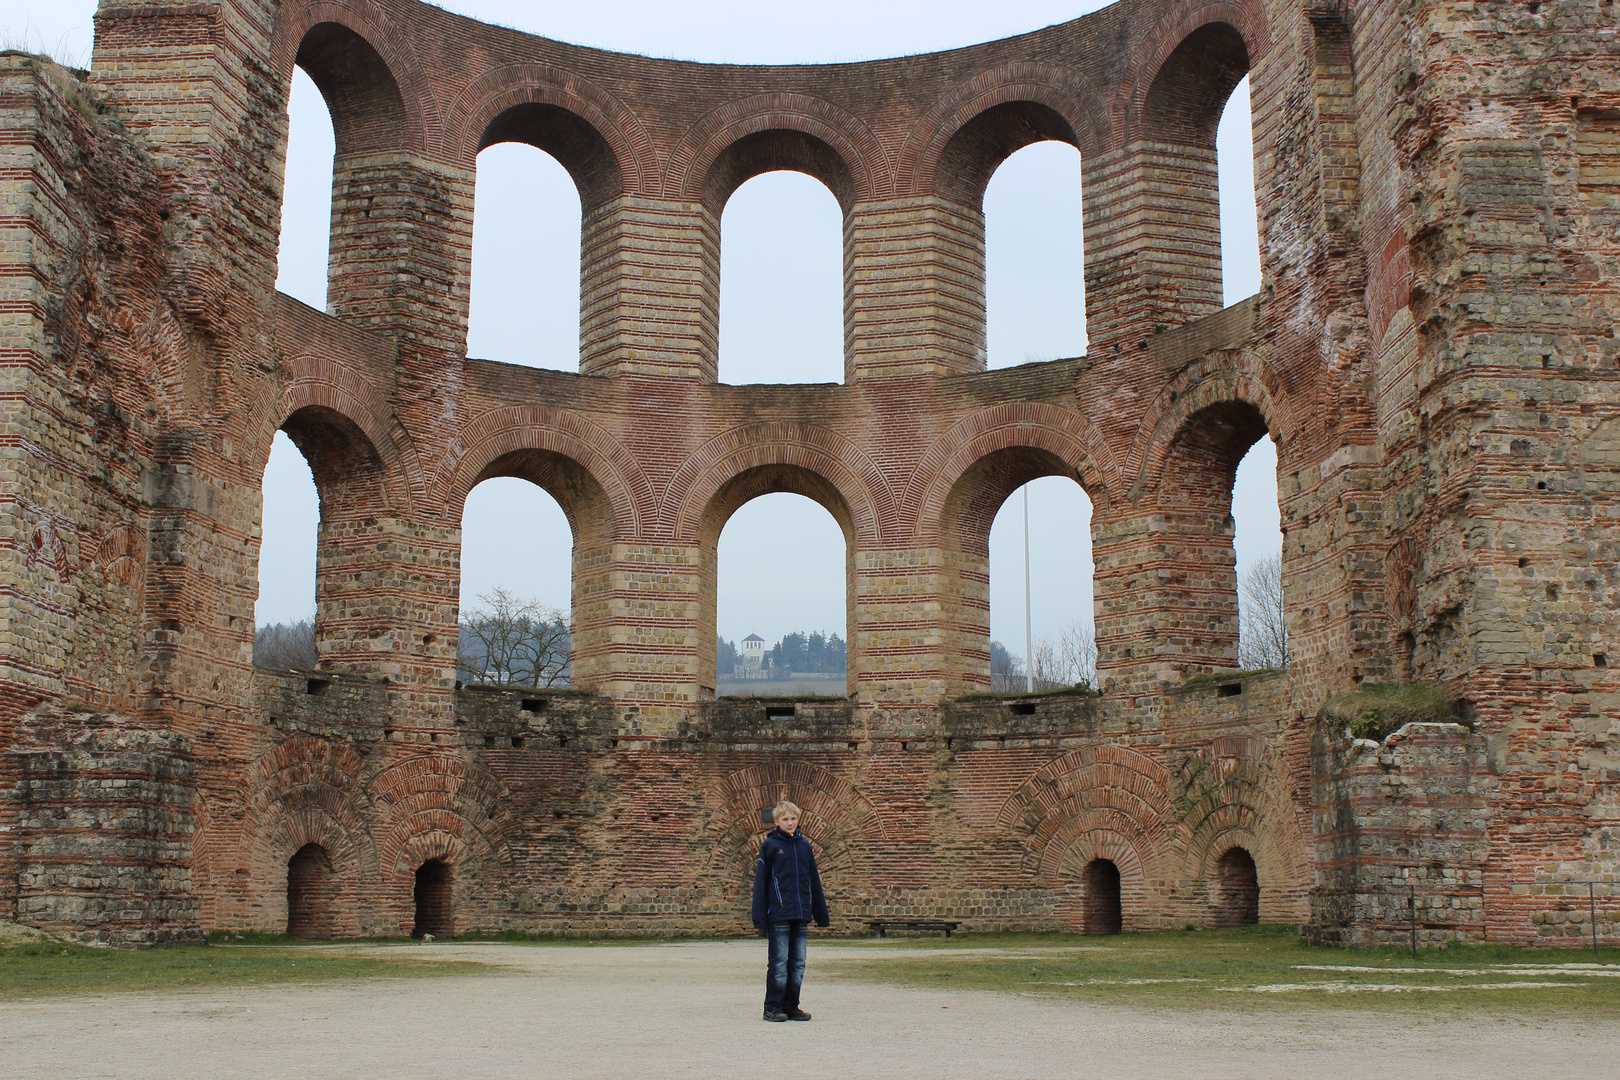 Mein Sohn in Trier bei den Kaiserthermen